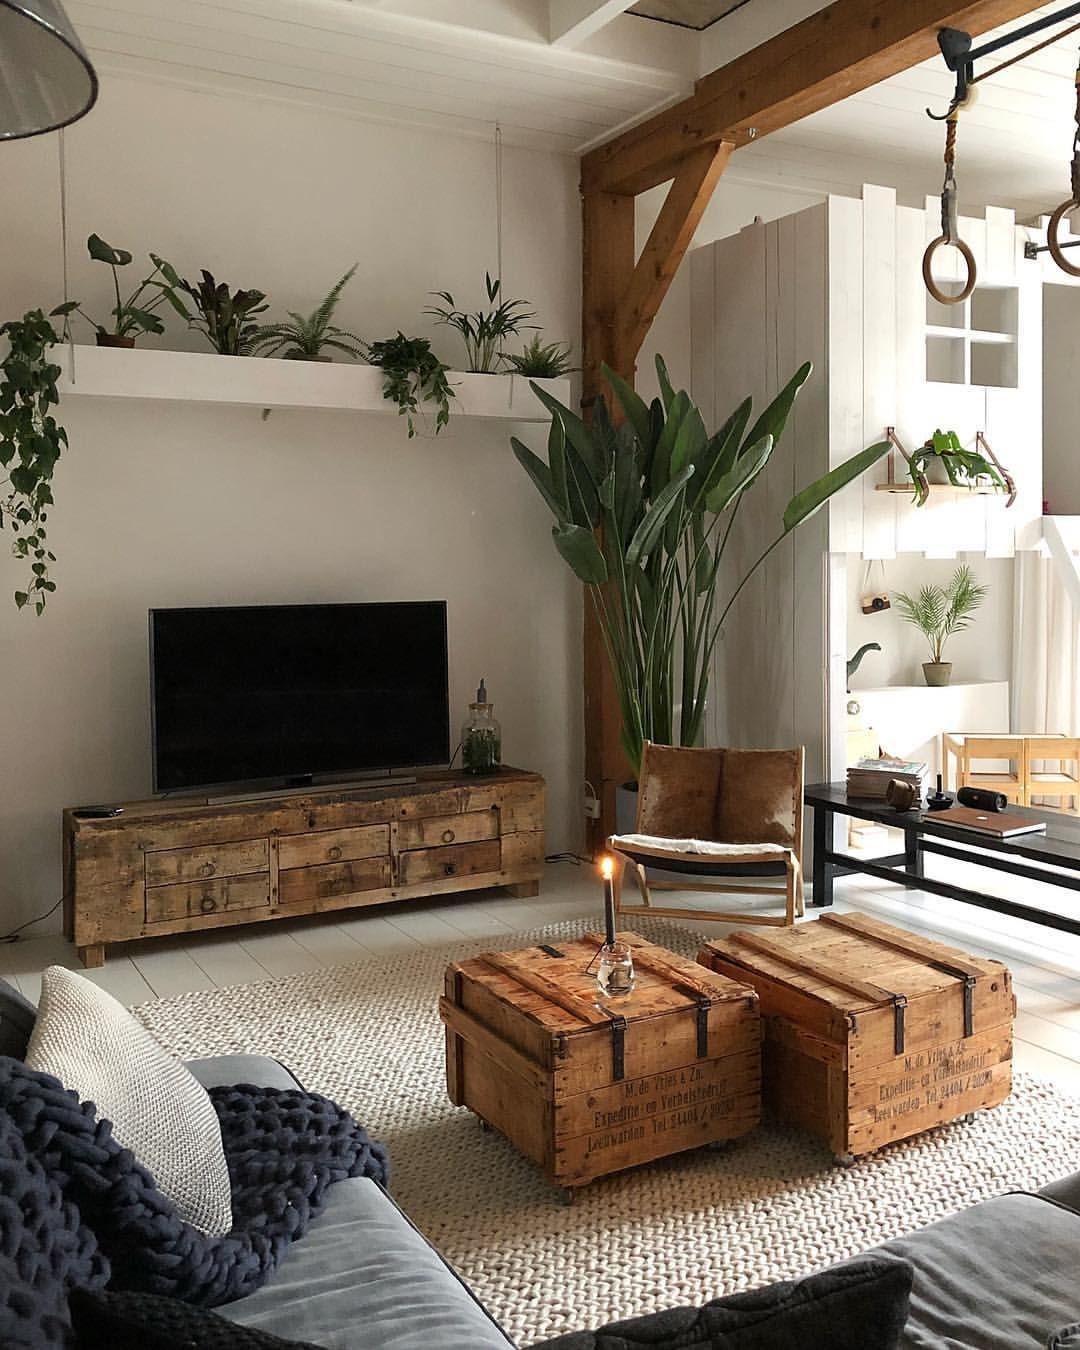 Small Modern Apartment Living Room Ideas: Jellina- Interior Blogger (jellinadetmar) • Instagram